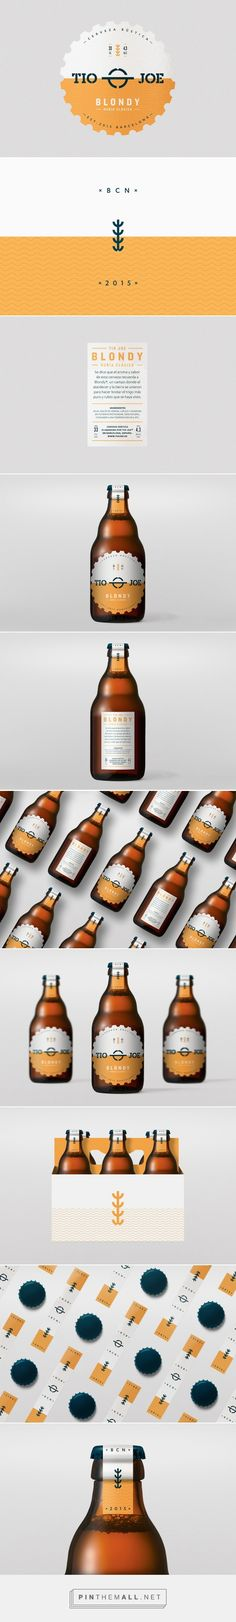 Blondy Beer packaging design by Diferente (Spain) - http://www.packagingoftheworld.com/2016/04/blondy.html